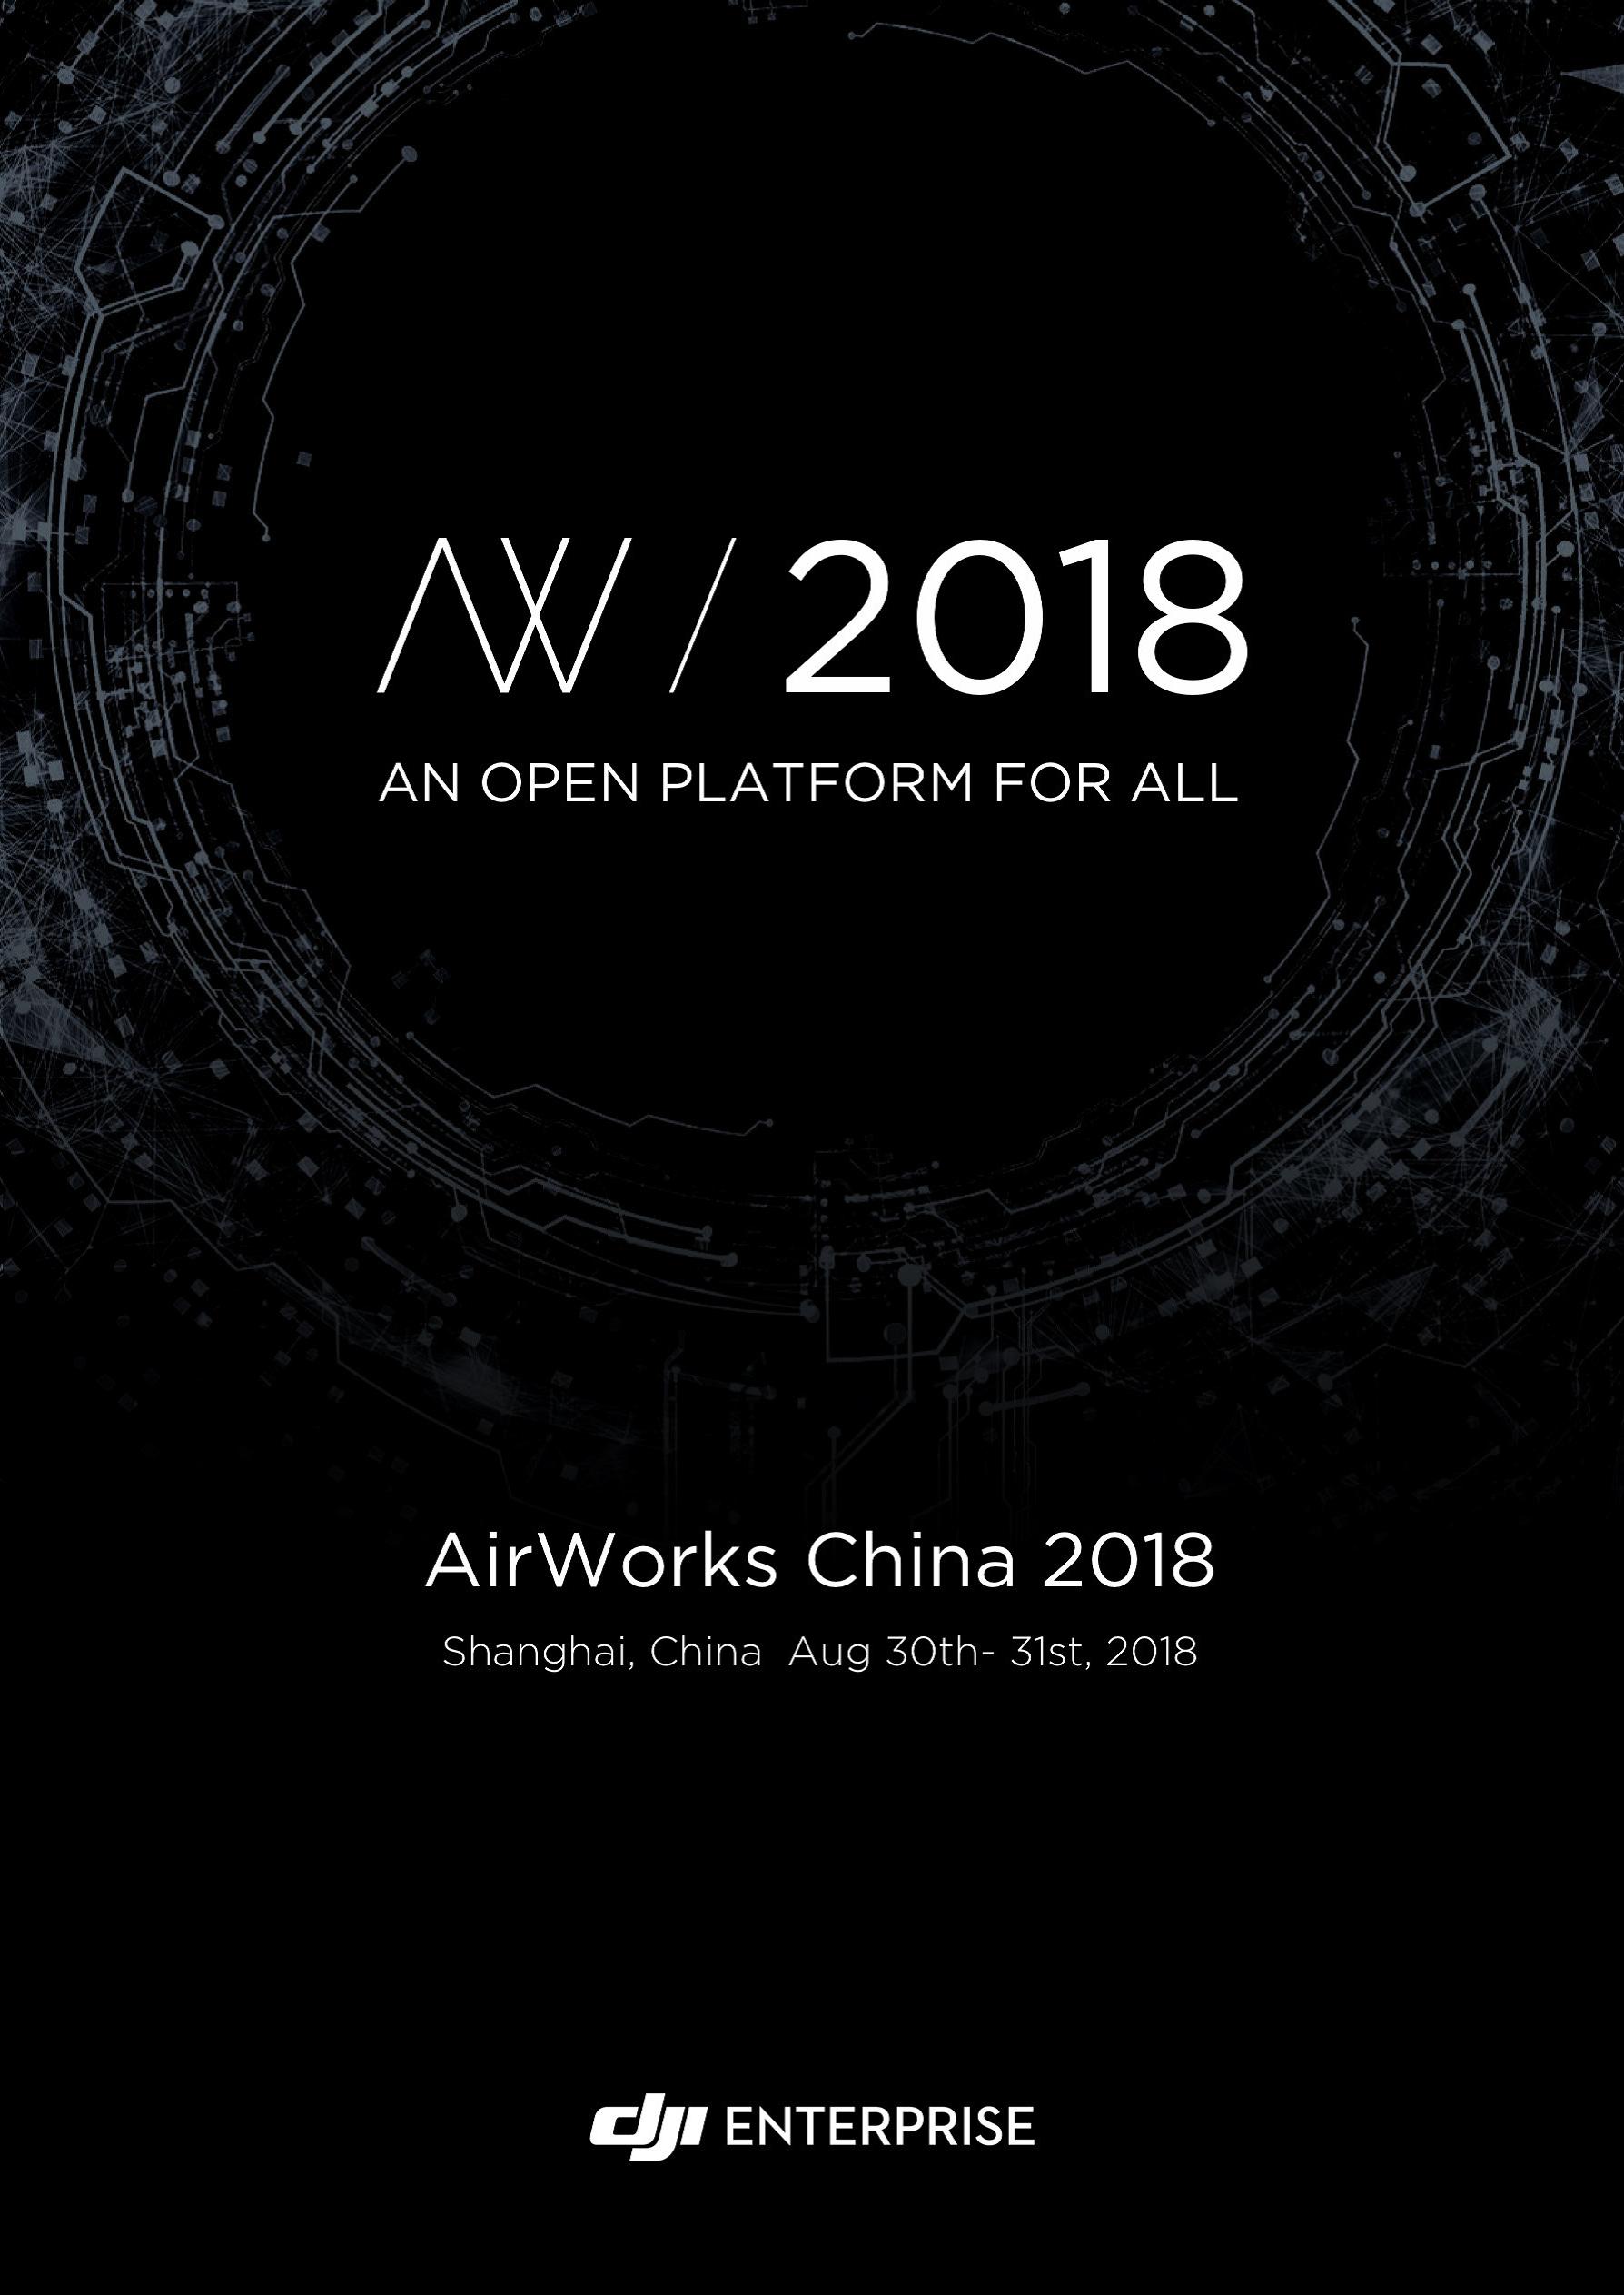 关于DJI【AirWorks China 2018】